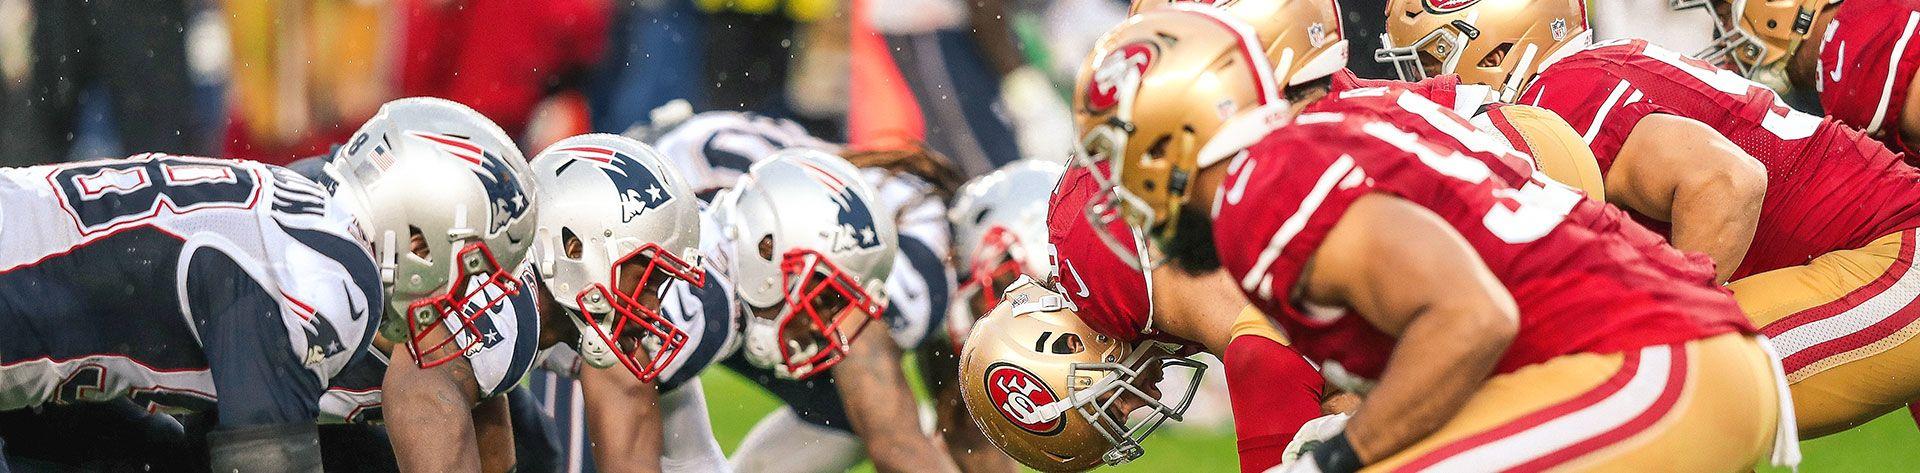 San Francisco 49ers at New England Patriots